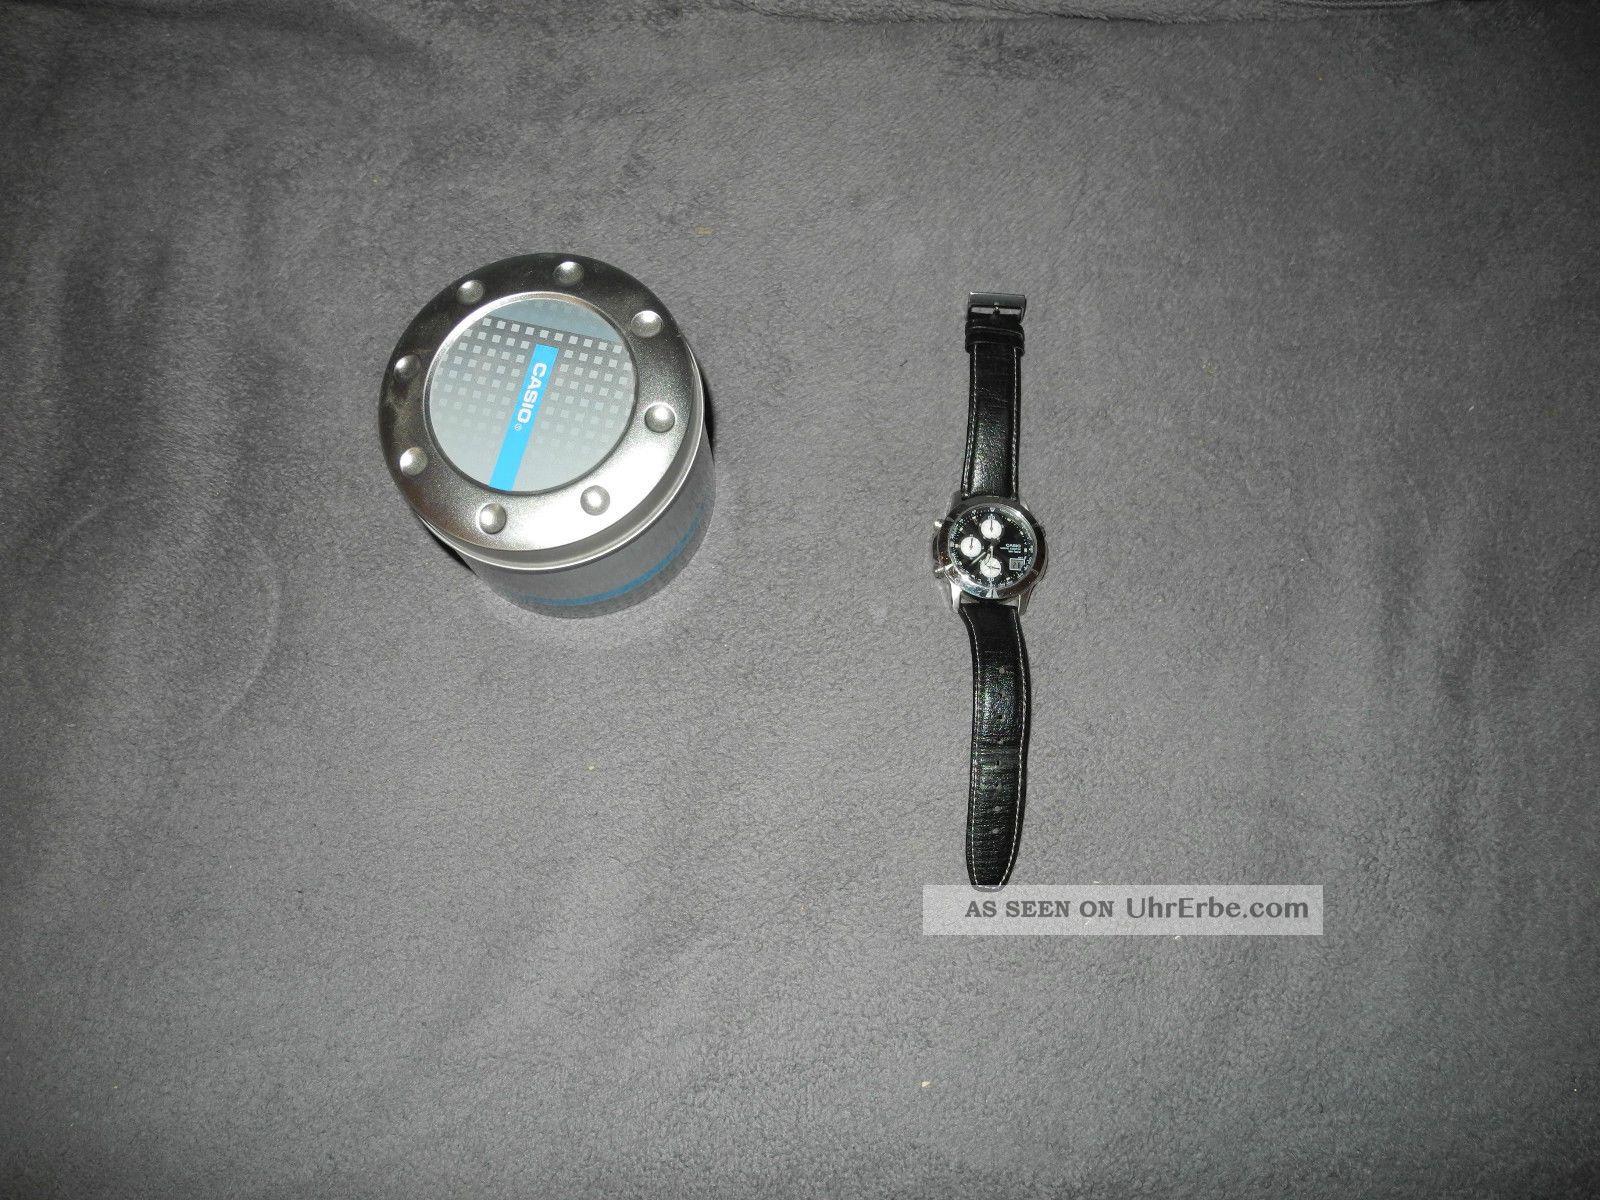 Casio Wave Ceptor Wvq - 560 Modul 4723 Lederarmband Funk Uhr Chronograph Armbanduhren Bild